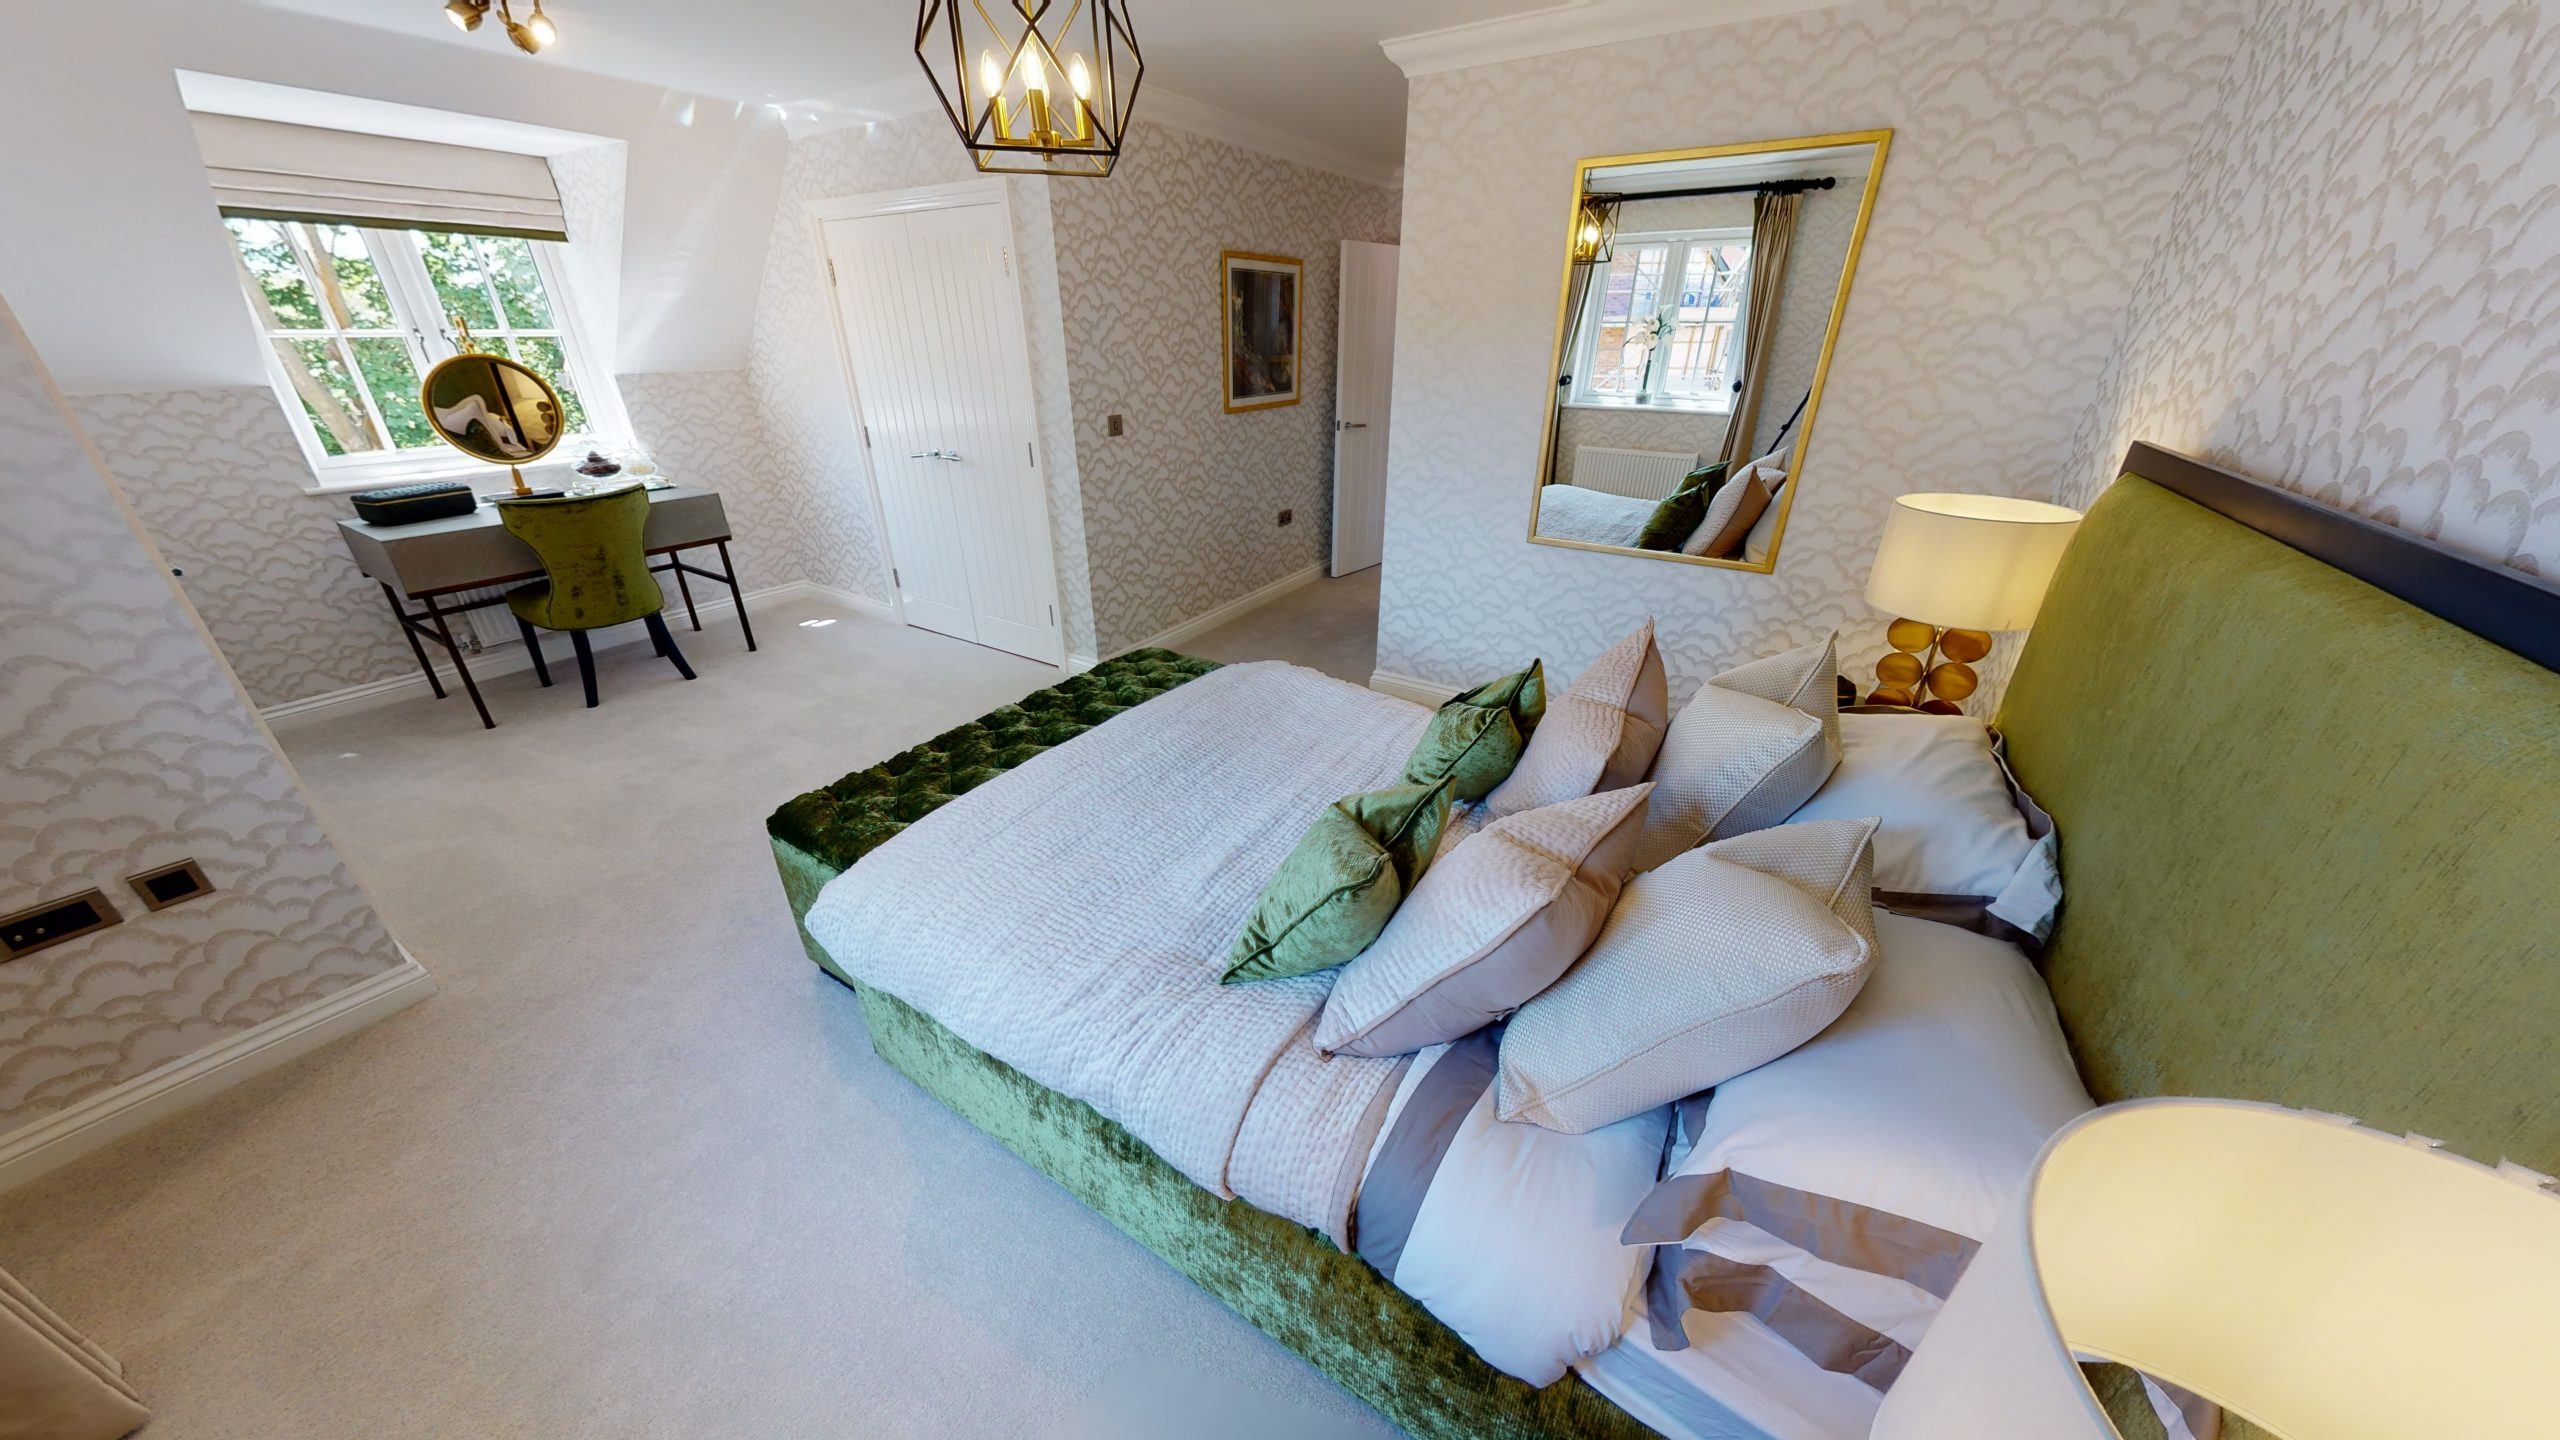 hawthornden yalding bedroom